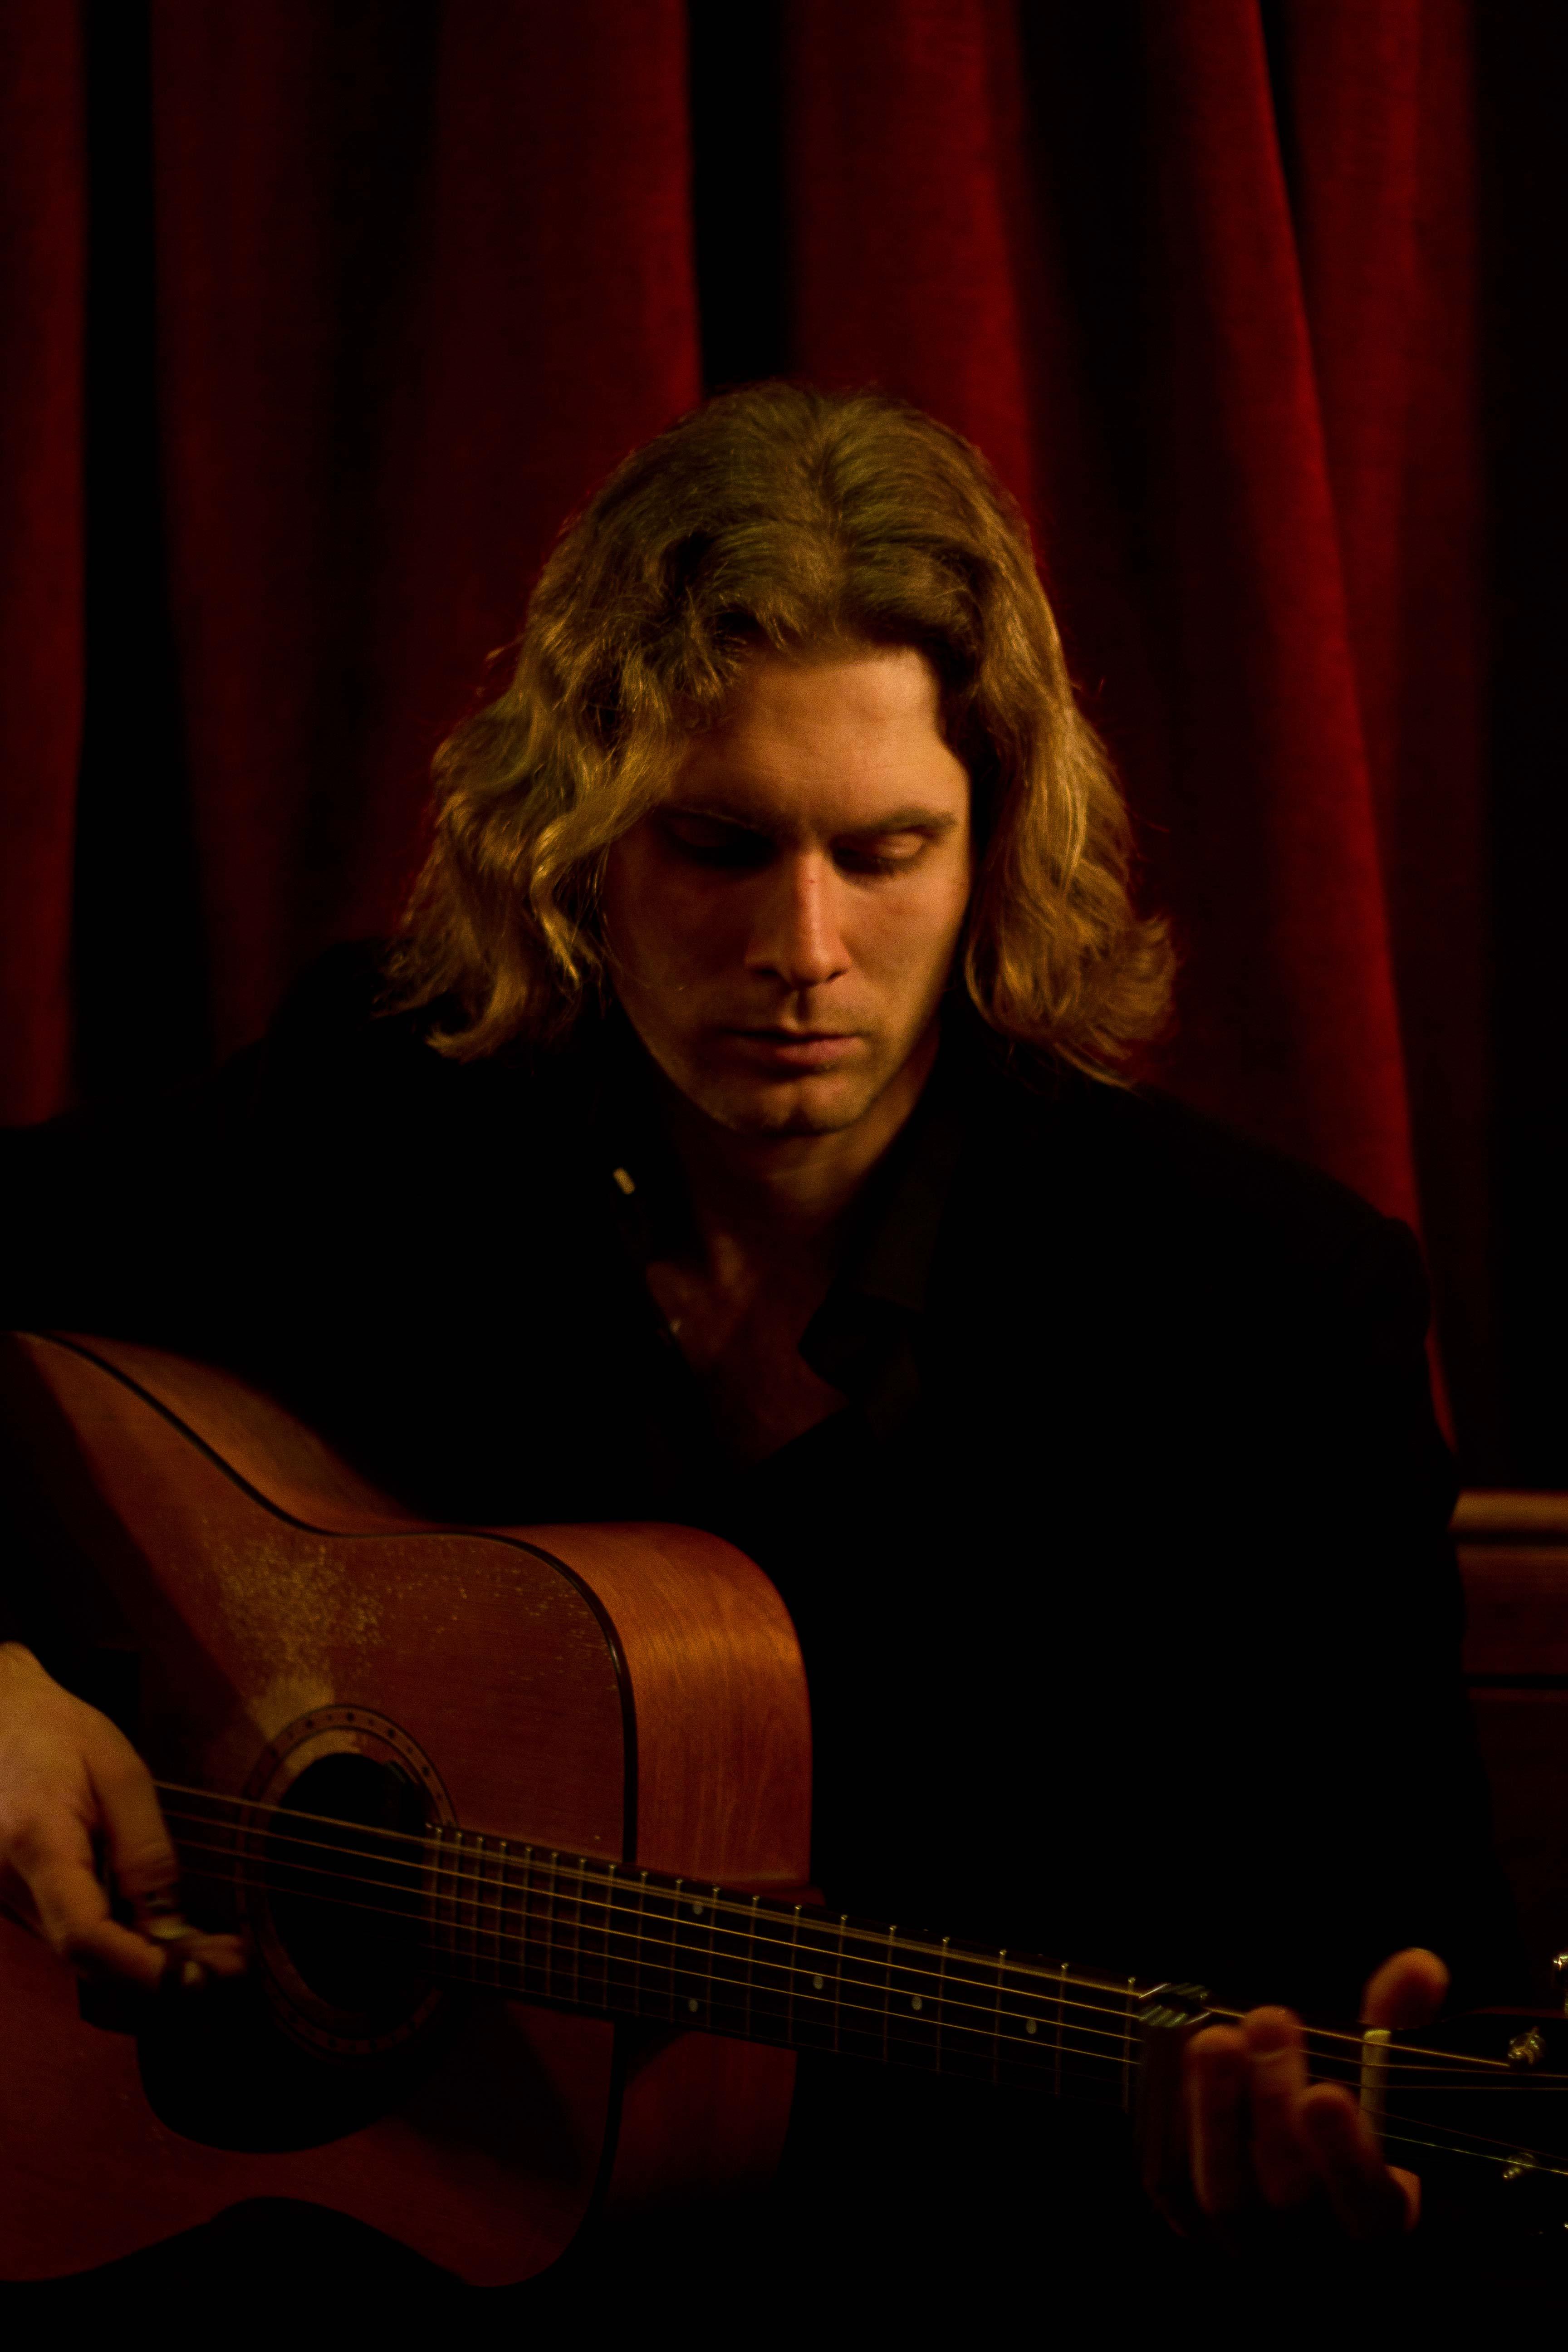 Andy Turnbull Guitar